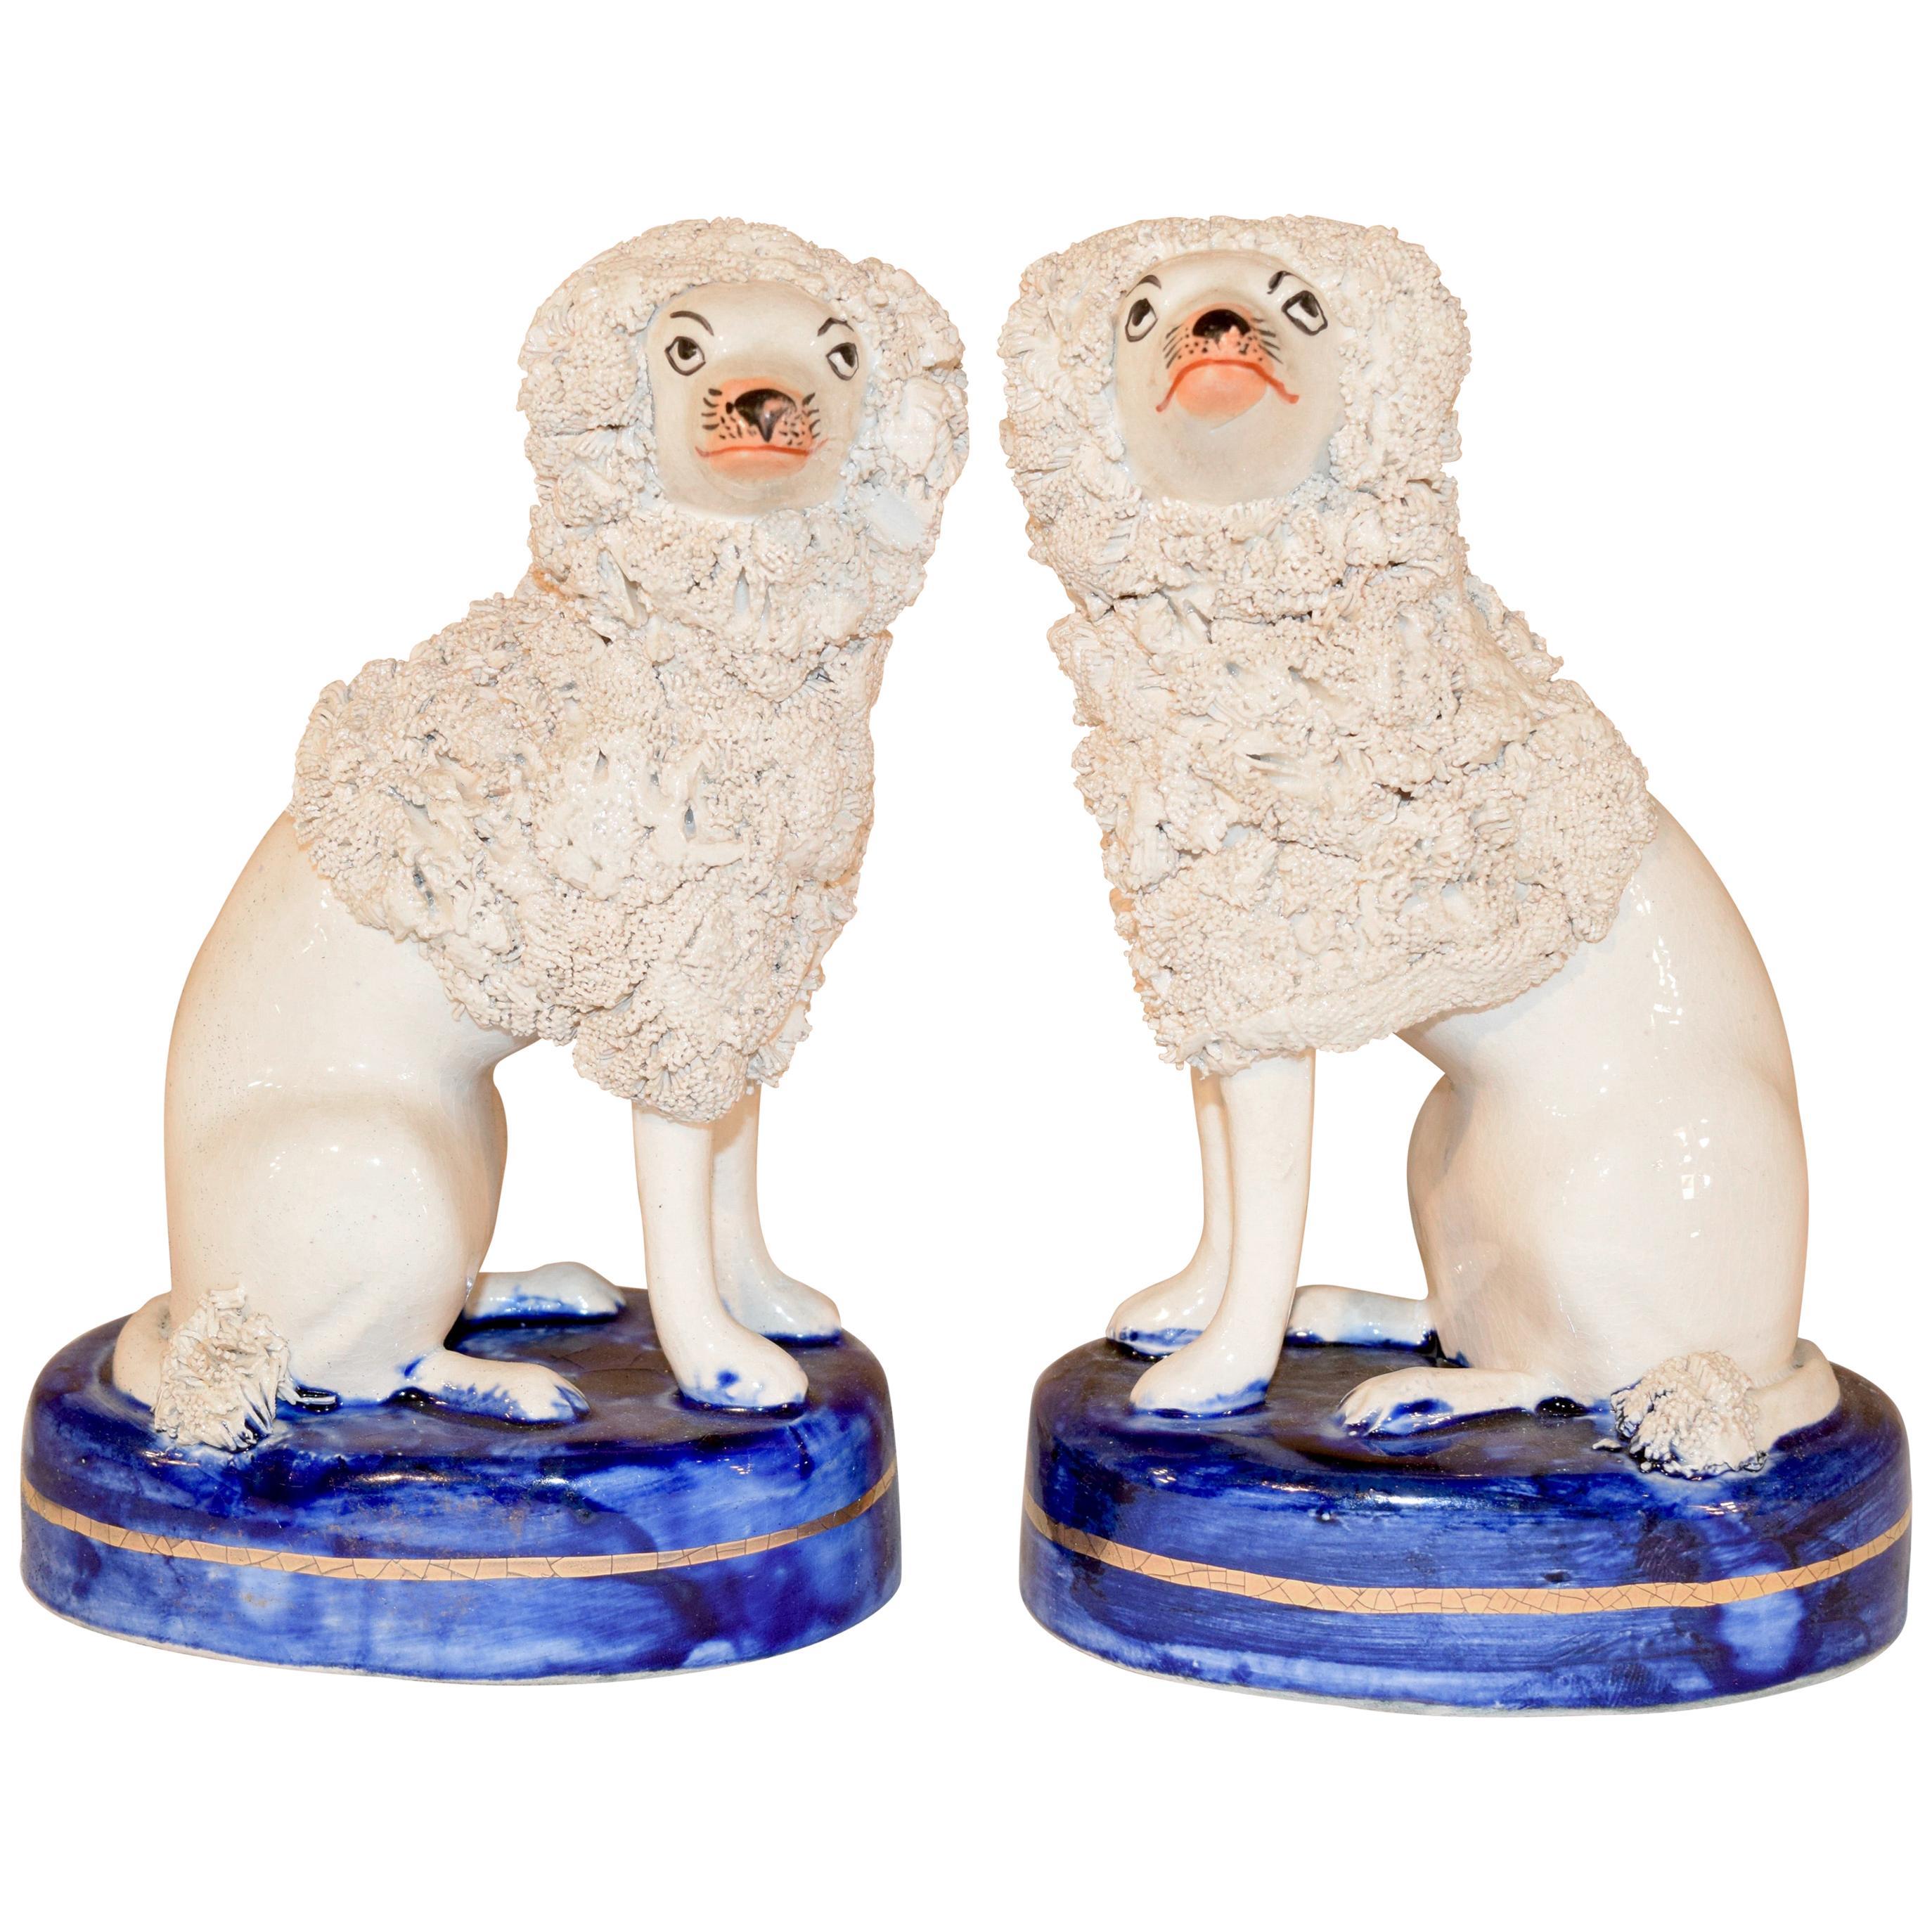 Pair of Vintage English Staffordshire Poodles